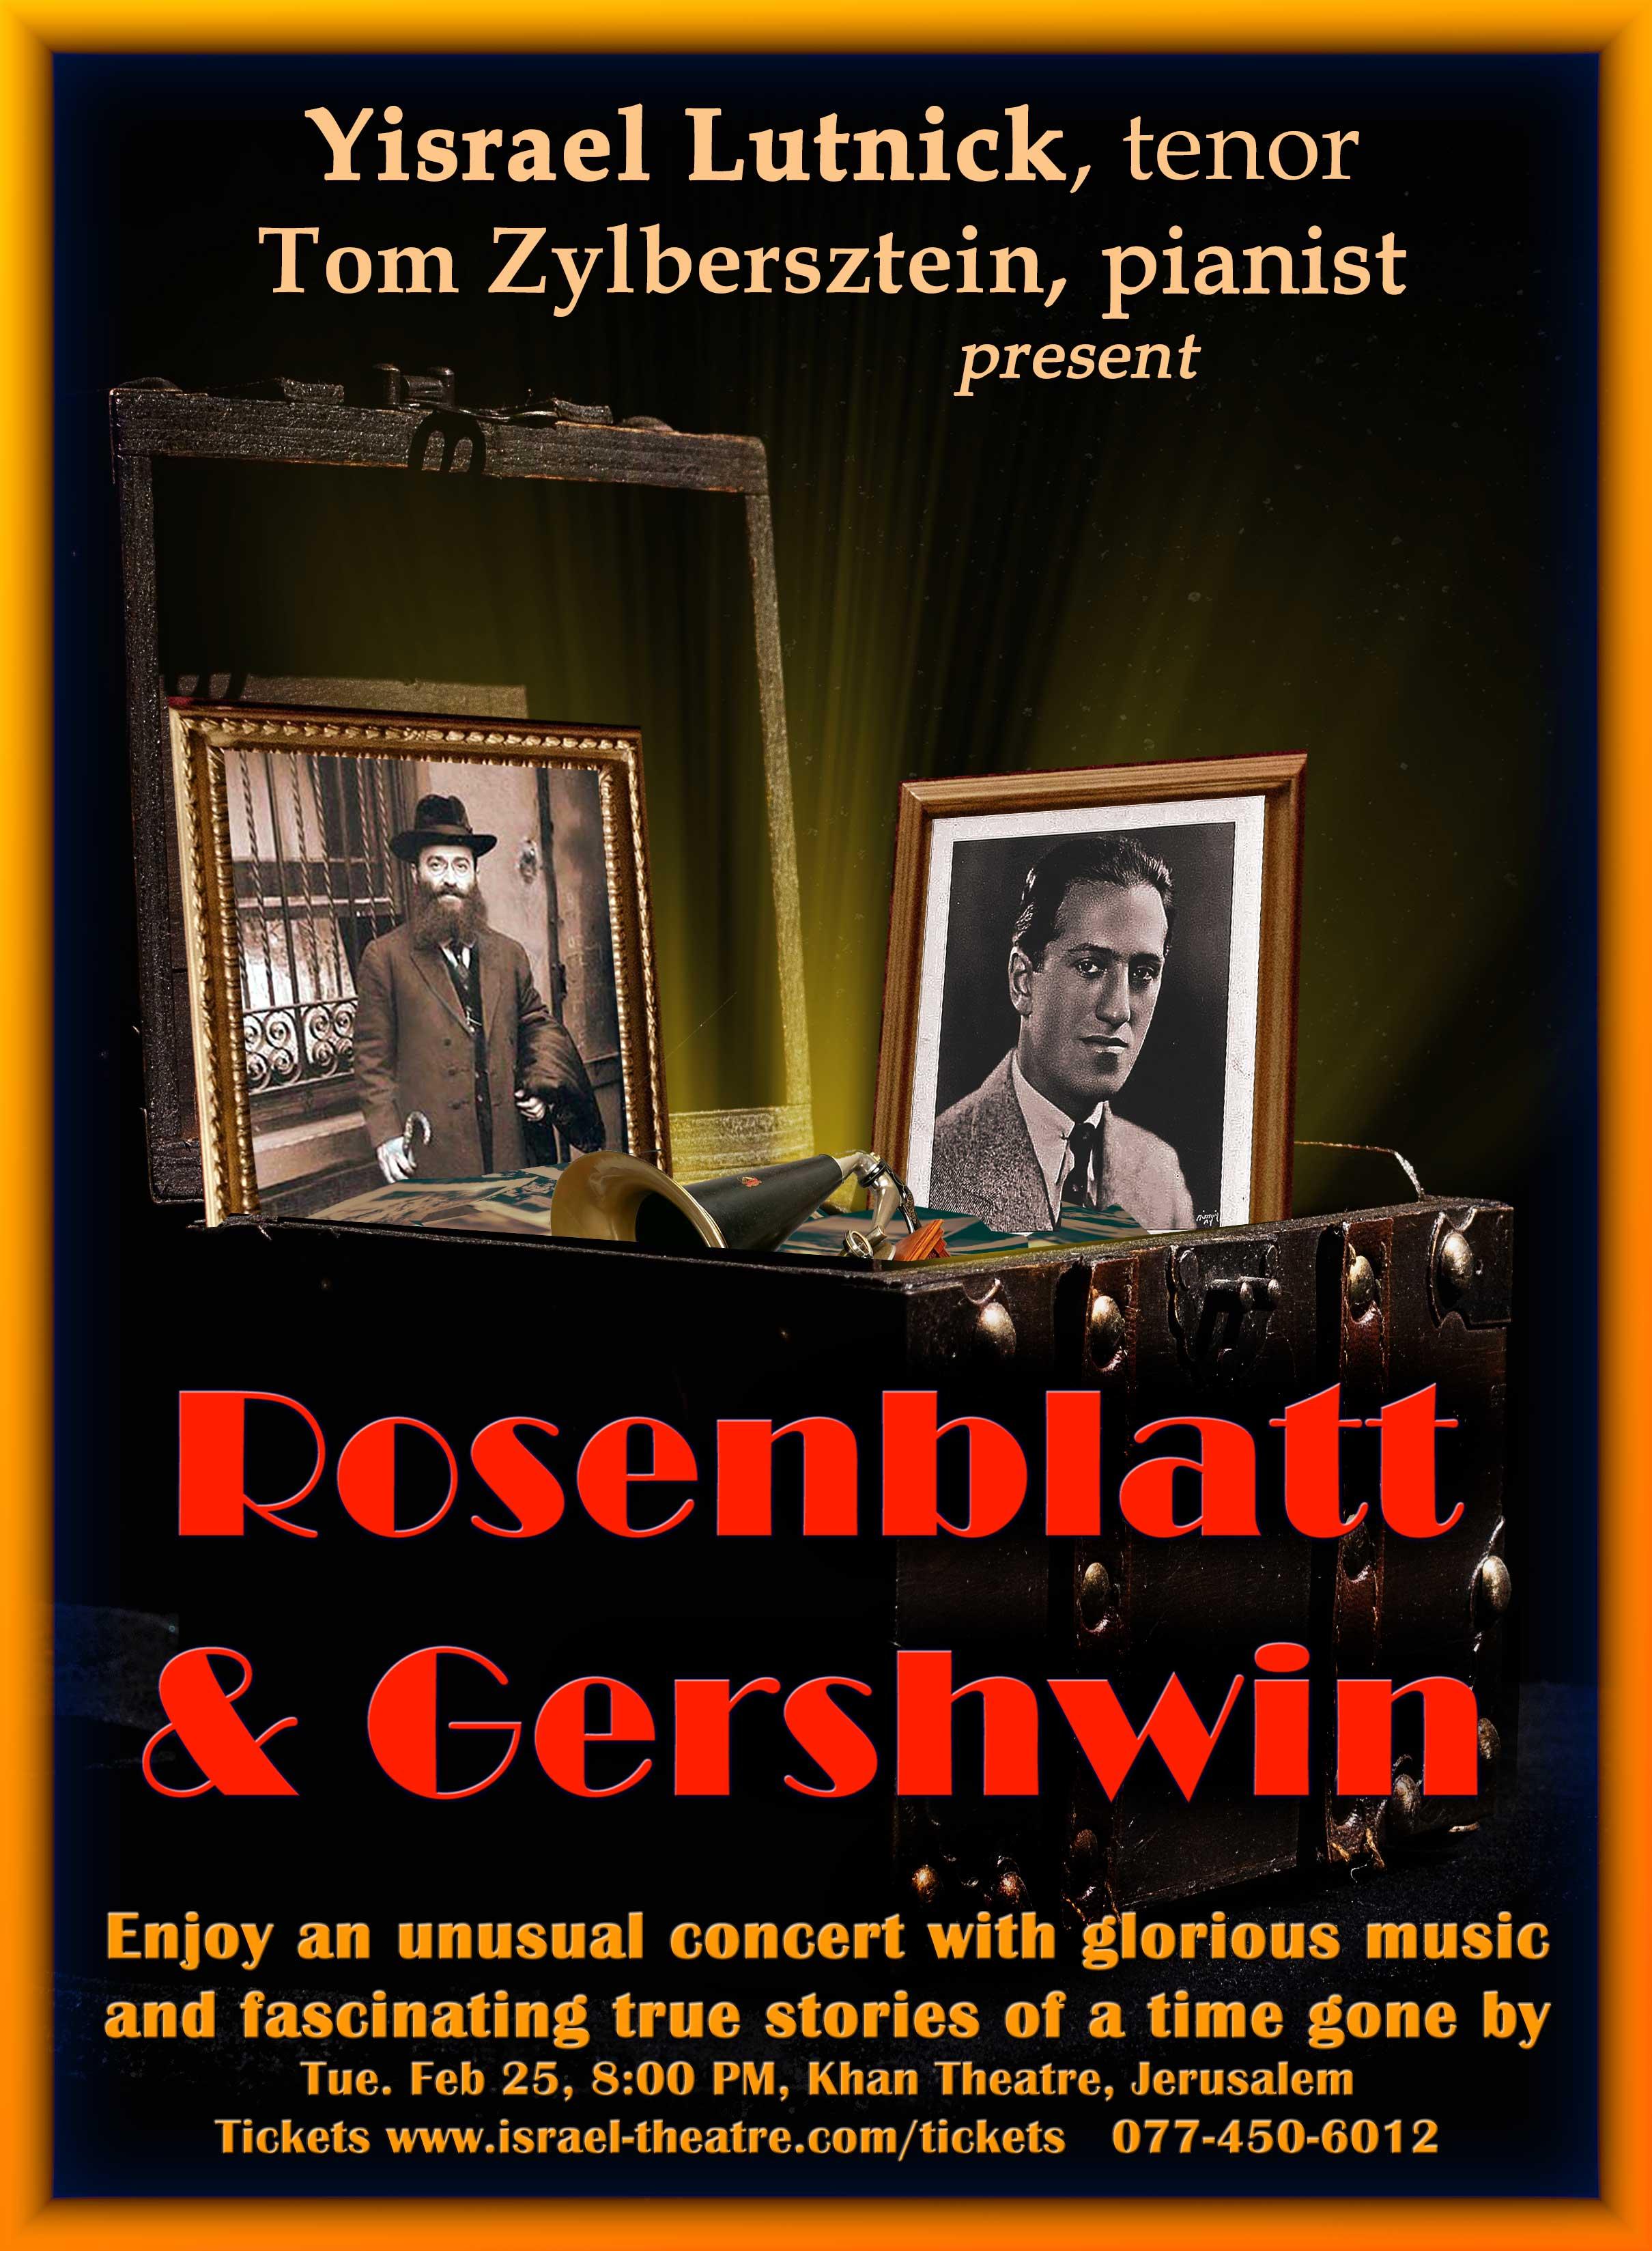 Rosenblatt & Gershwin, with Yisrael Lutnick